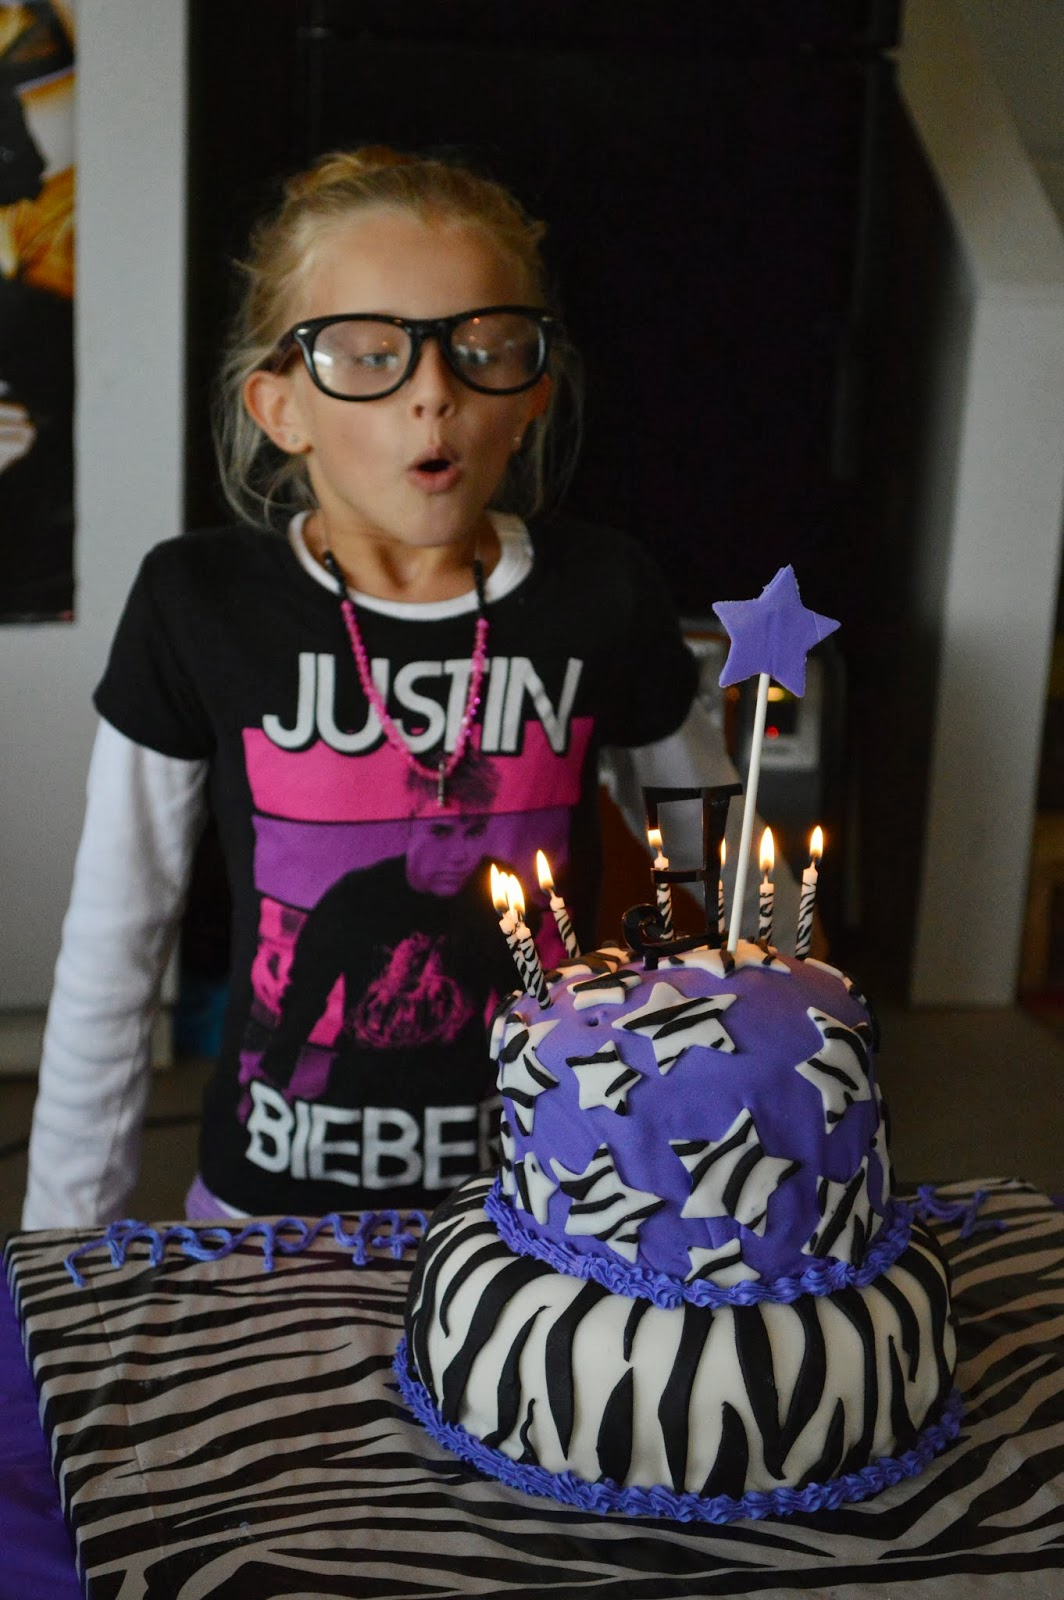 Mom Swim Bike Run How To Have A Justin Bieber Birthday Party